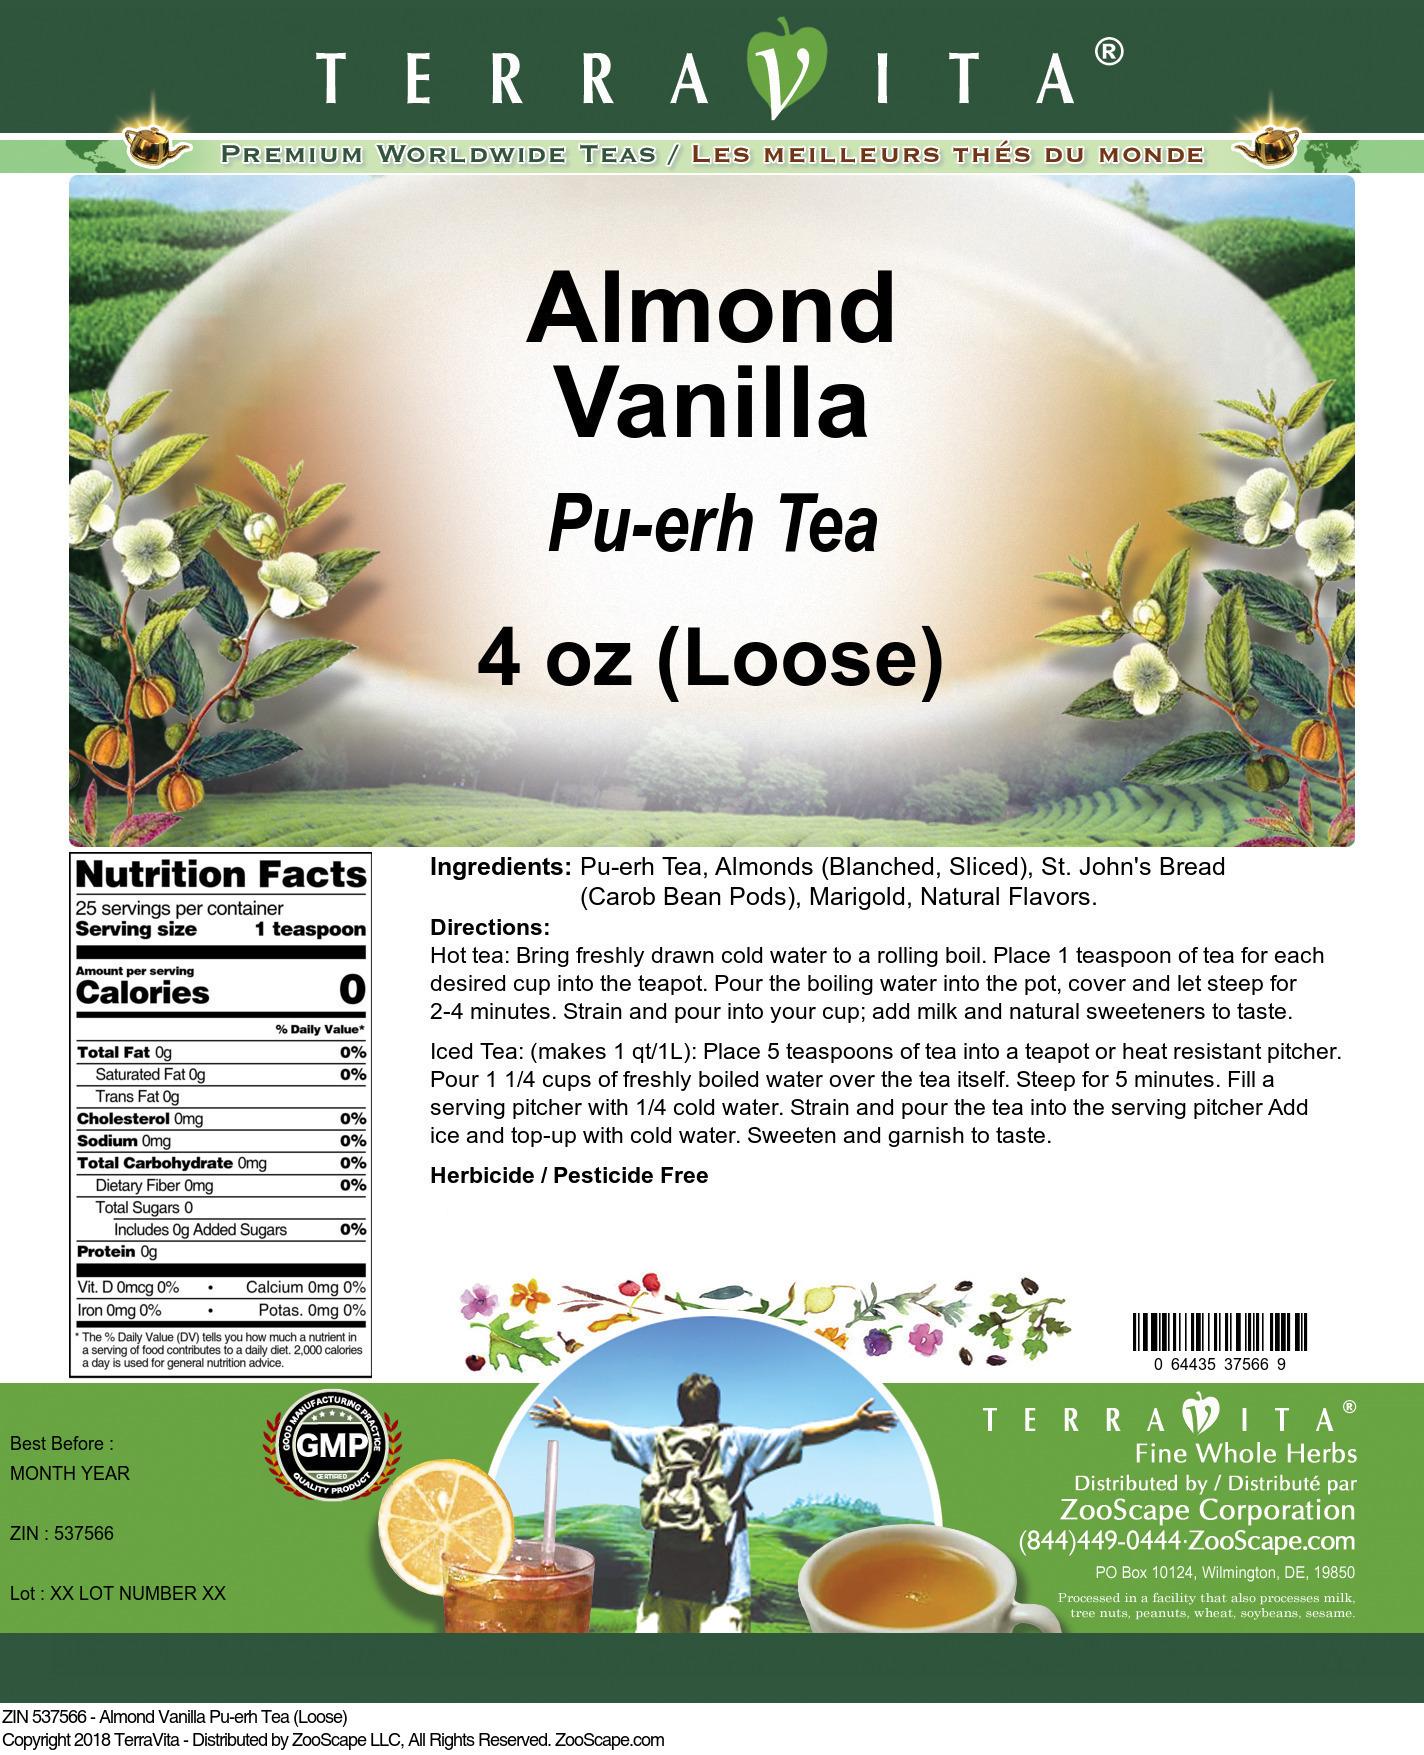 Almond Vanilla Pu-erh Tea (Loose)